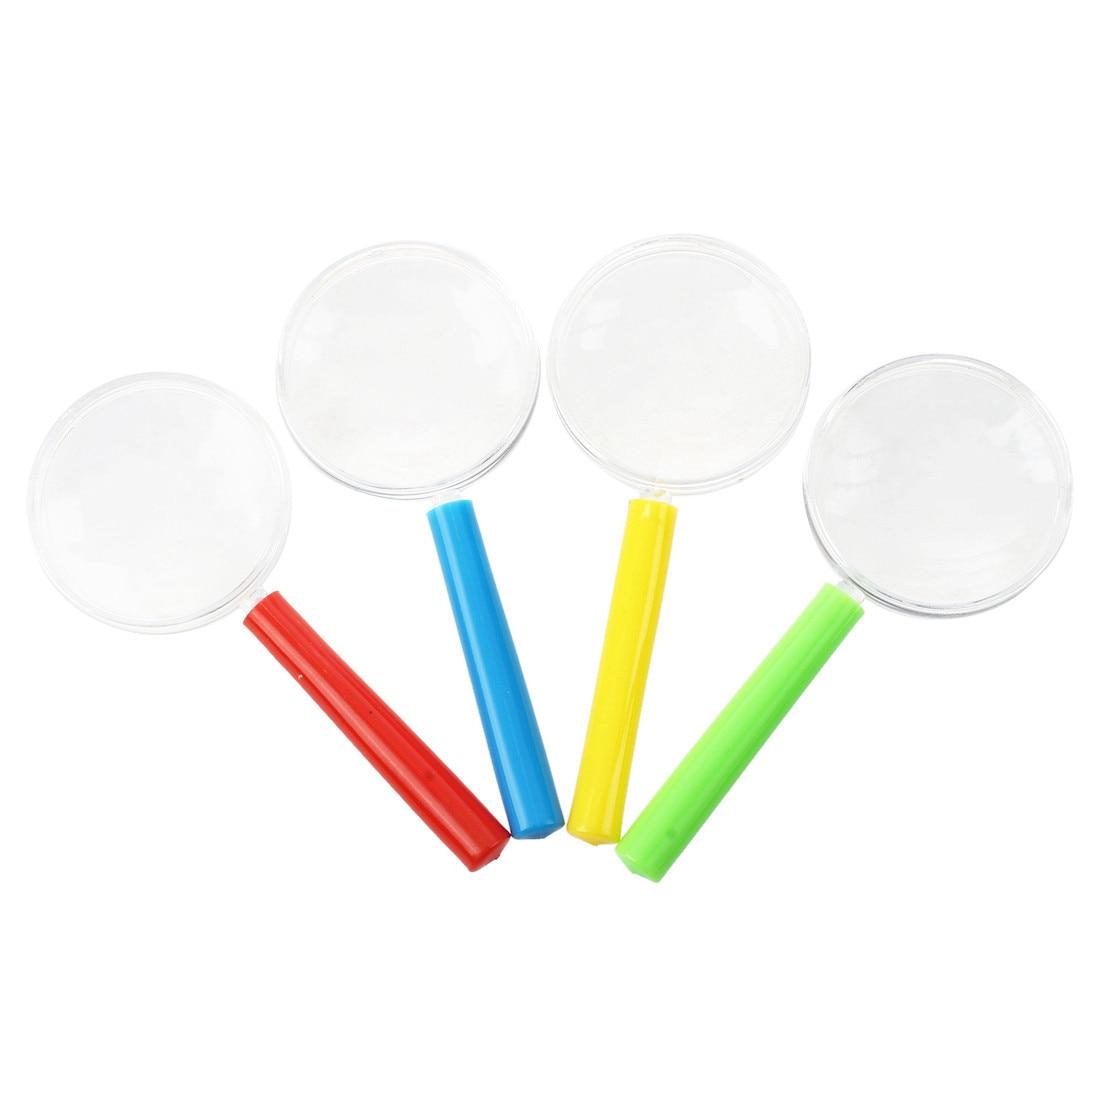 4pcs Plastic Mini Magnifying Glass Children's Toys